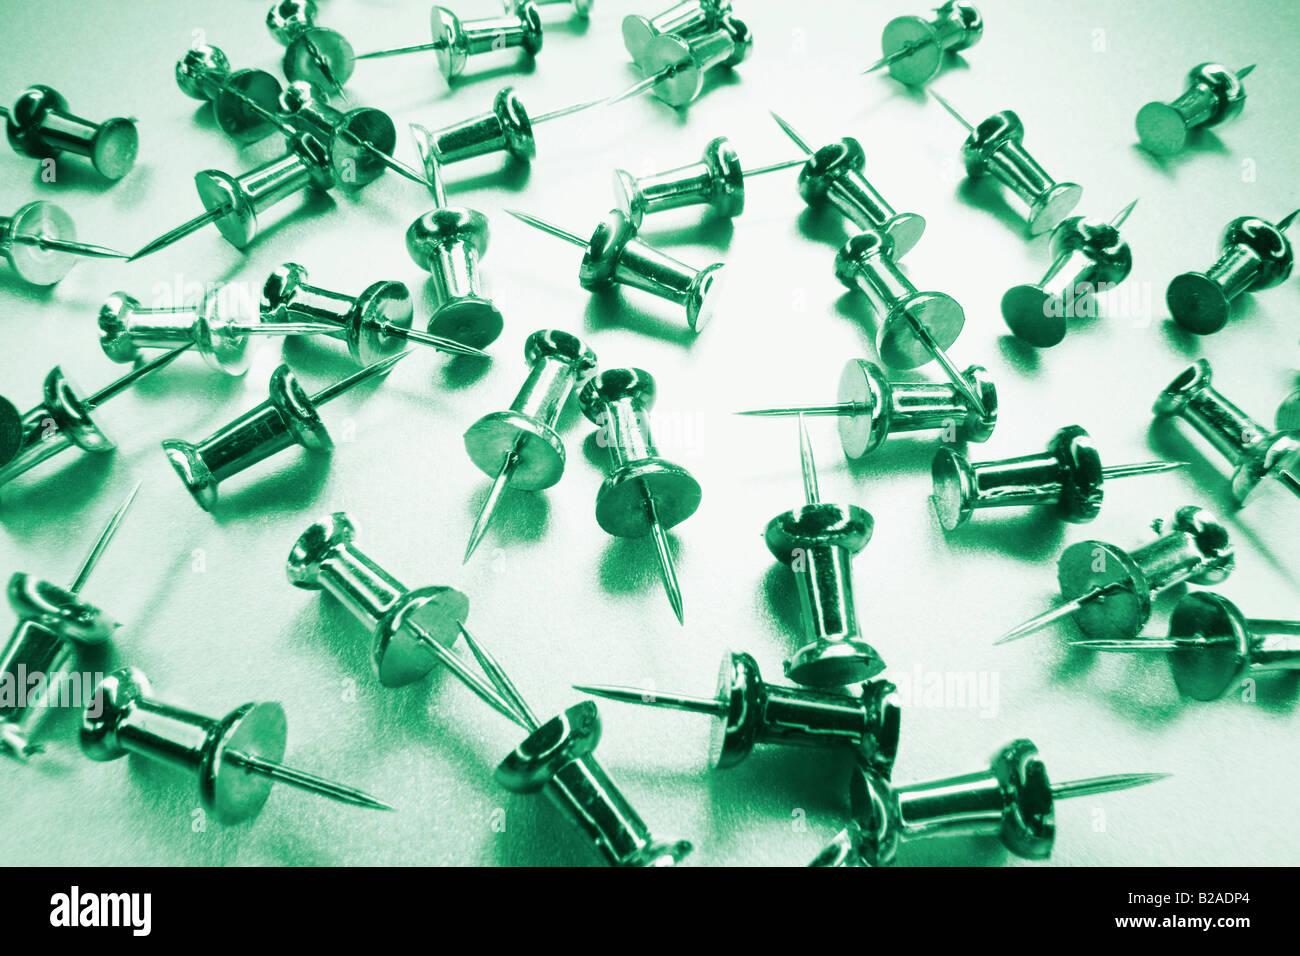 Push Pins - Stock Image